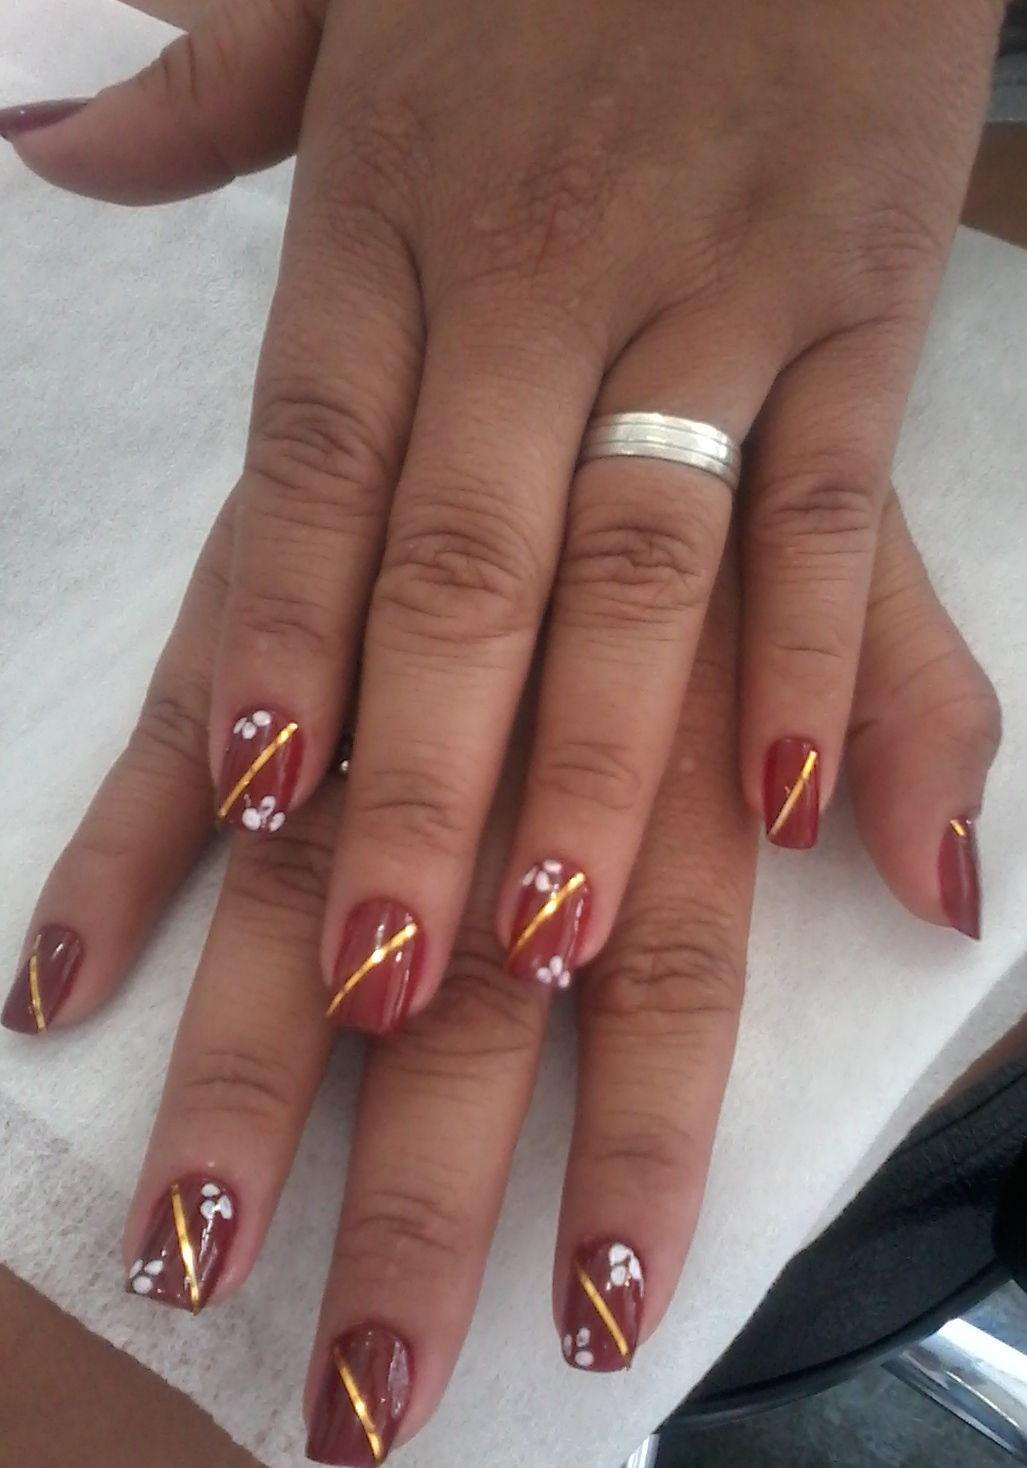 unhas que fiz em clientes manicure e pedicure manicure e pedicure manicure e pedicure